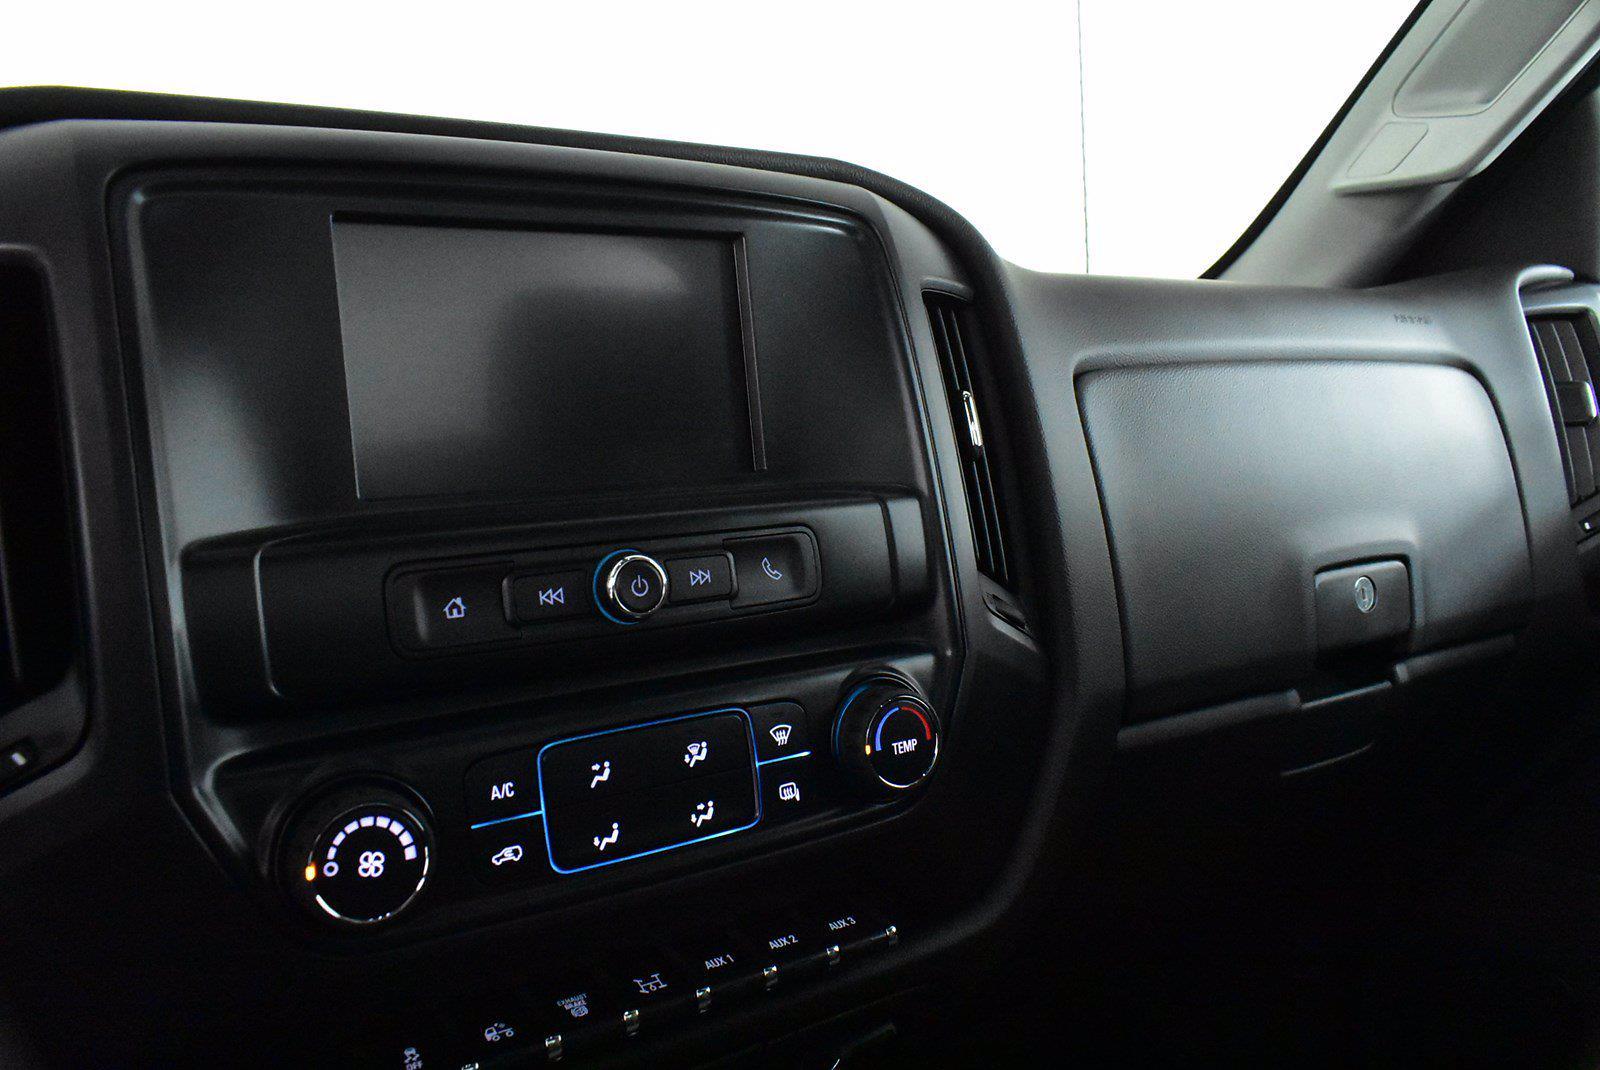 2019 Chevrolet Silverado 5500 DRW 4x2, Cab Chassis #D191062 - photo 7